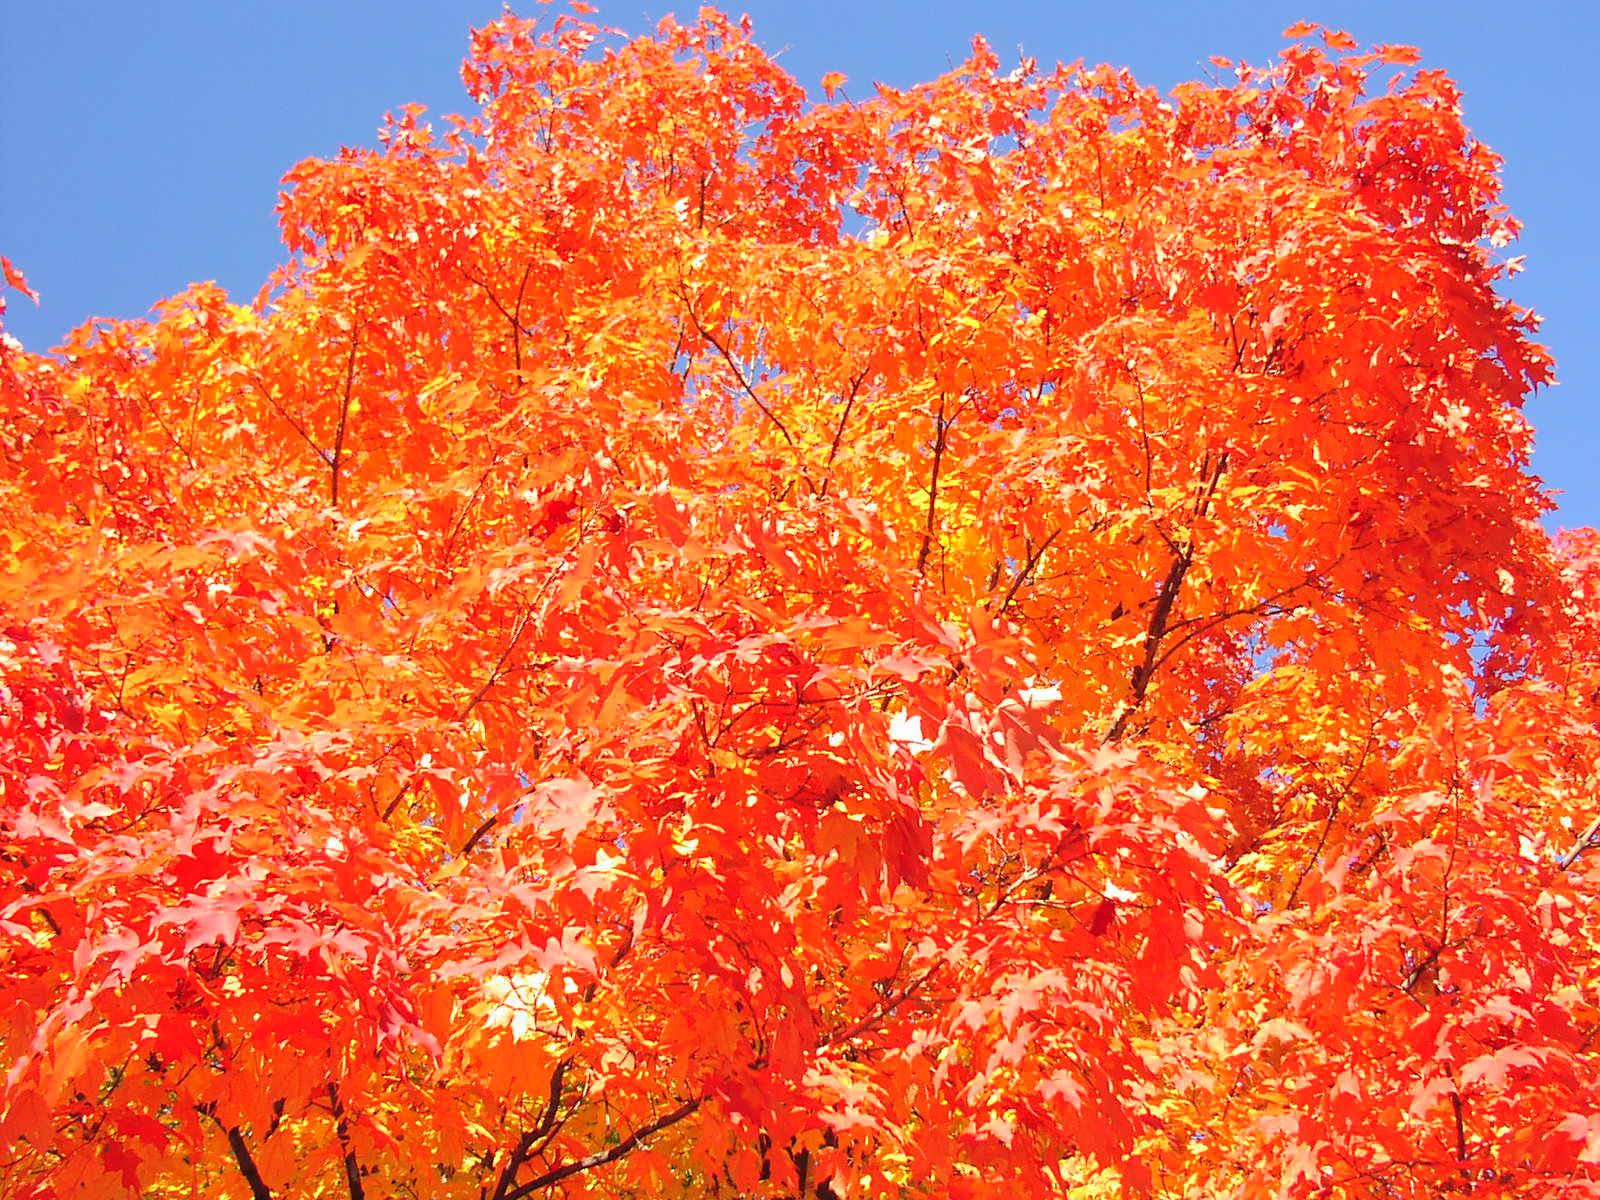 Fall foliage on Kenny Ave.